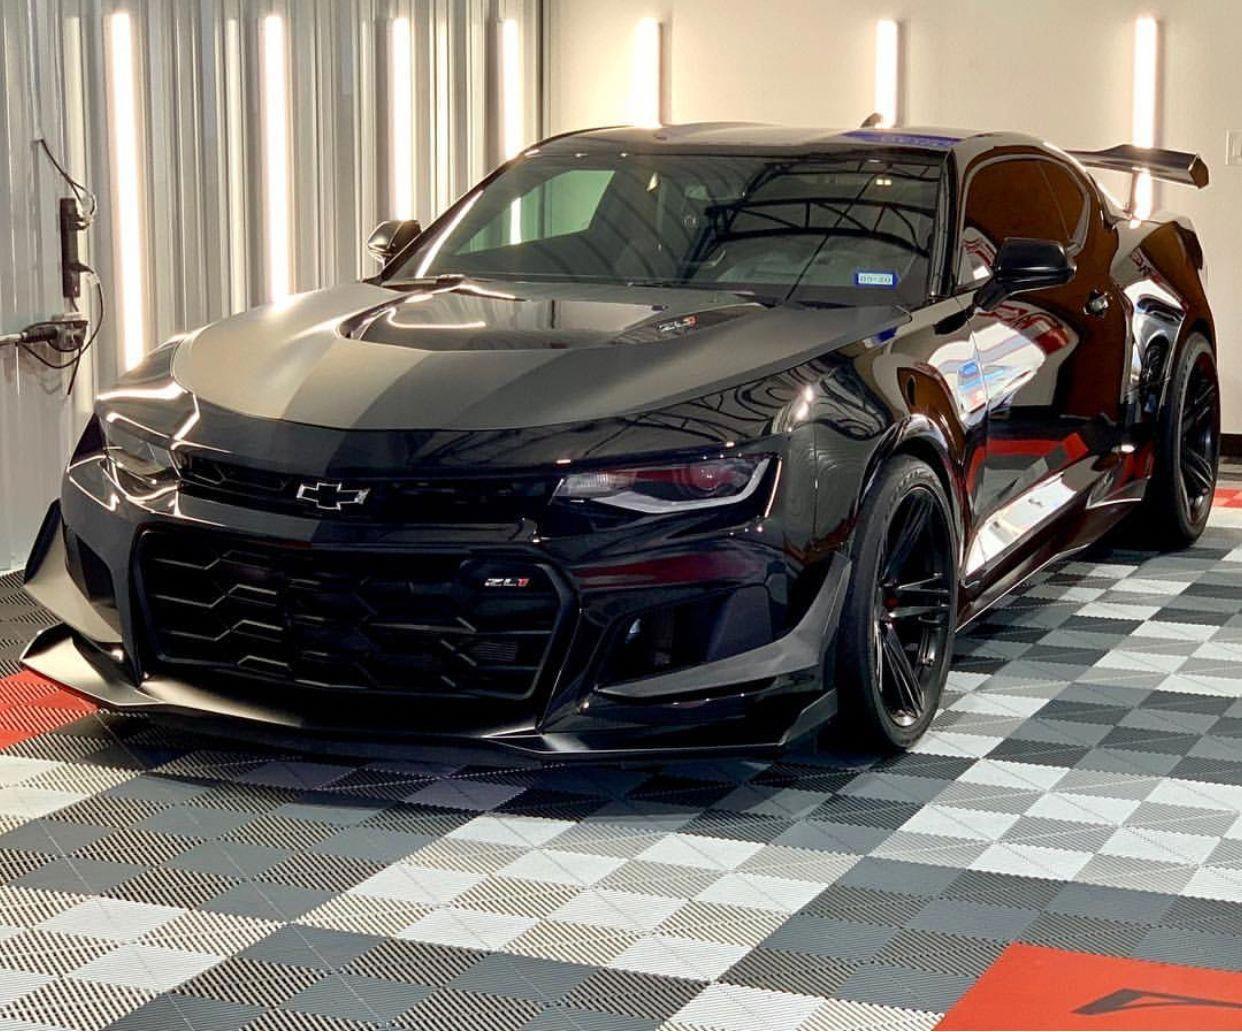 Chevrolet Camaro Zl1 1le Painted In Black Photo Taken By Luccielitedetail On Instagram Camaro Car Chevrolet Camaro Zl1 Camaro Zl1